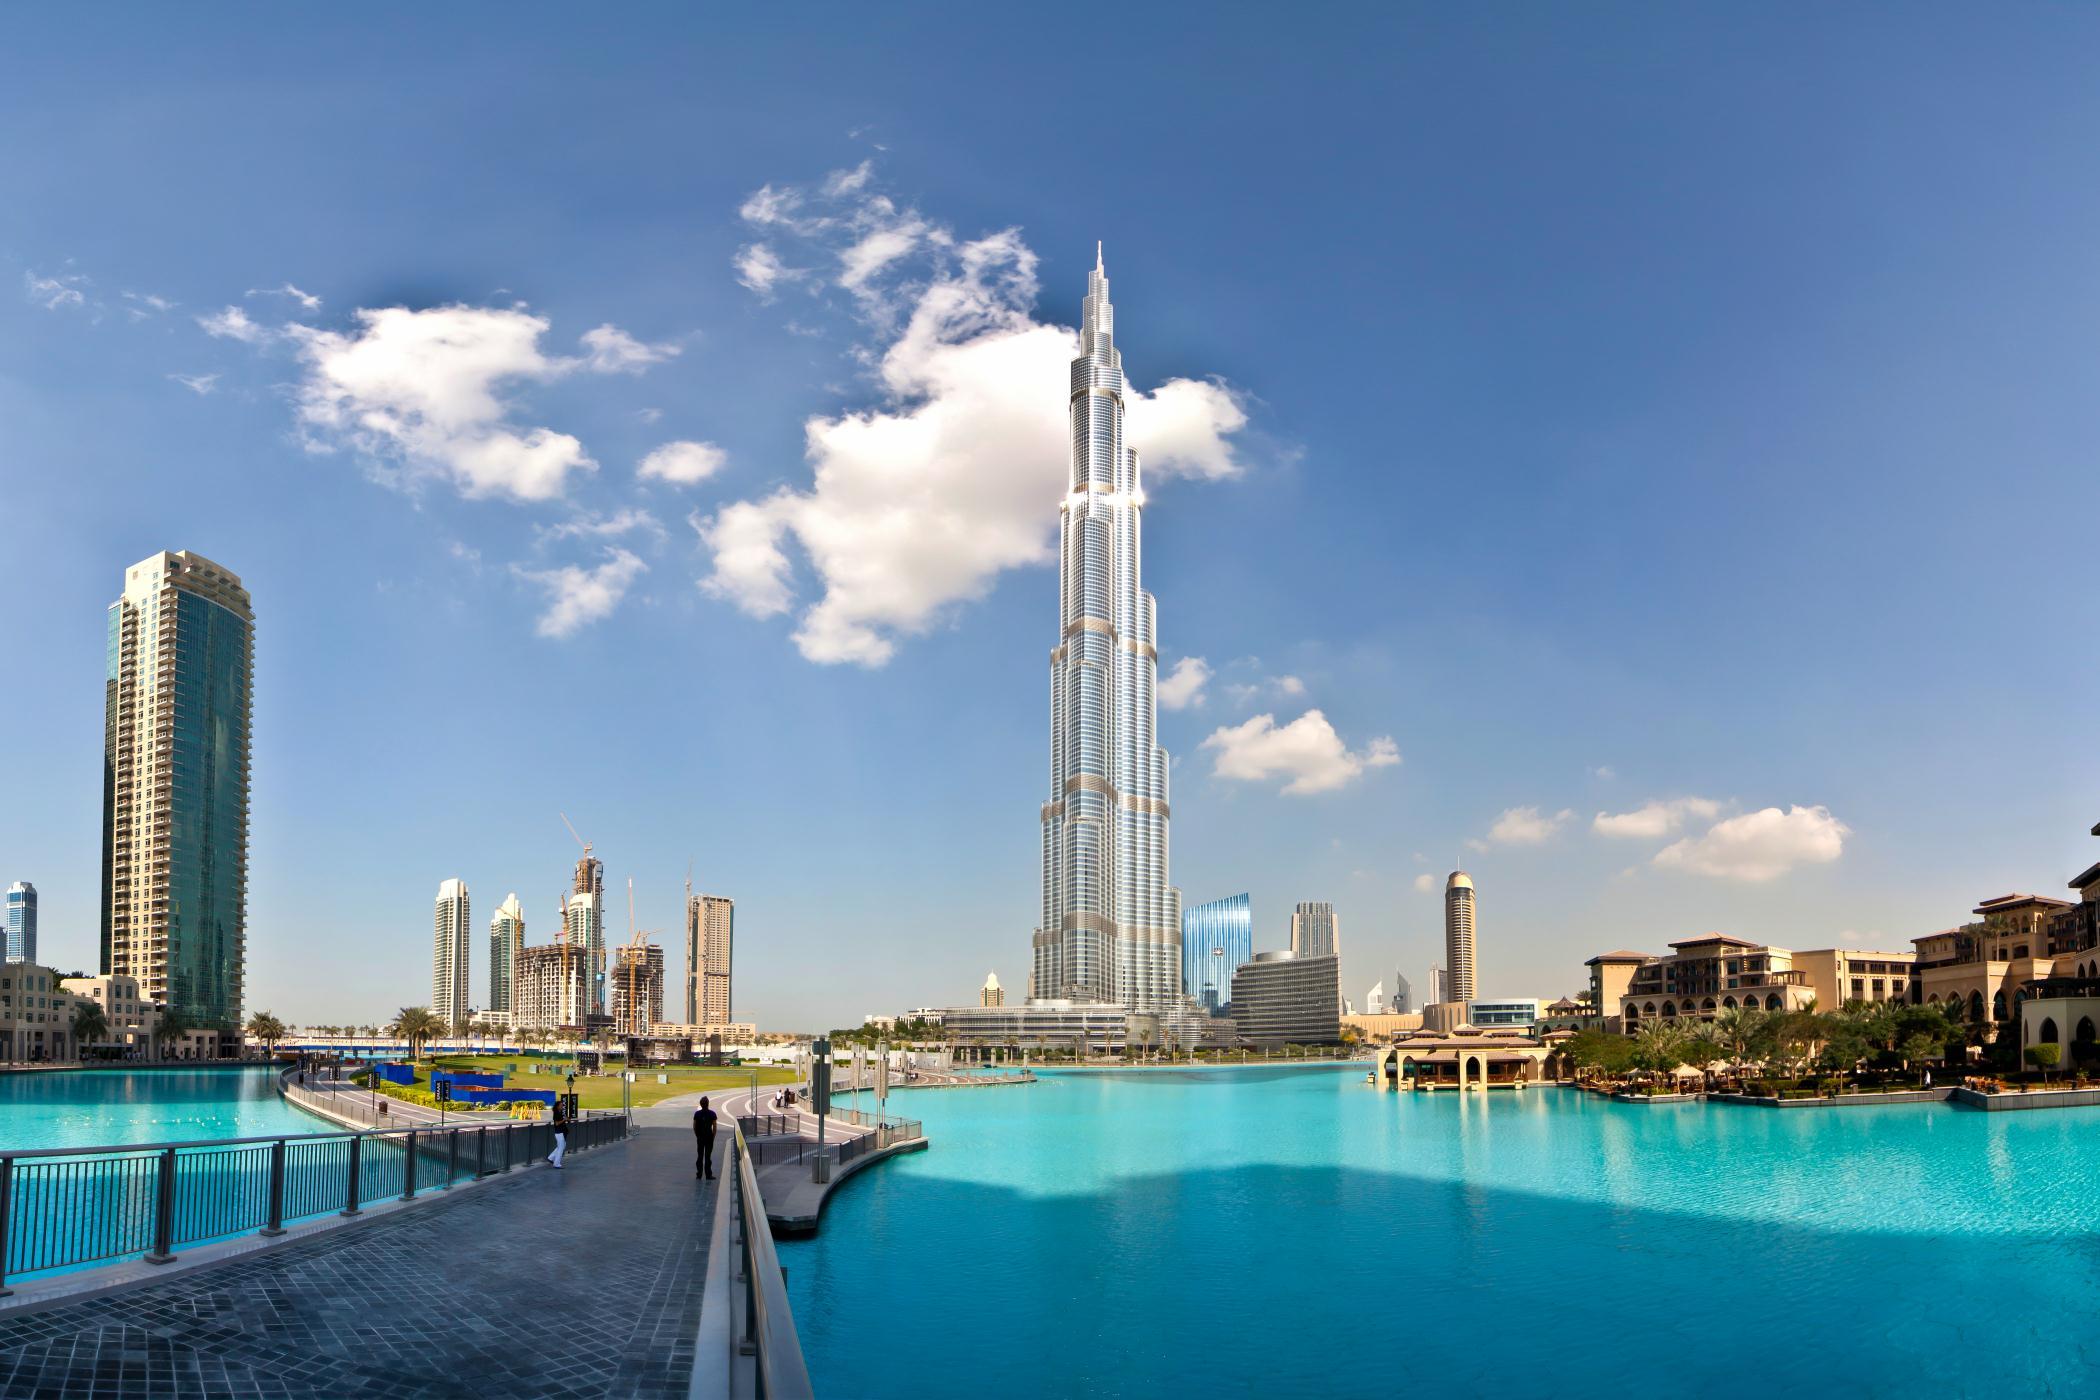 DubaiTurm